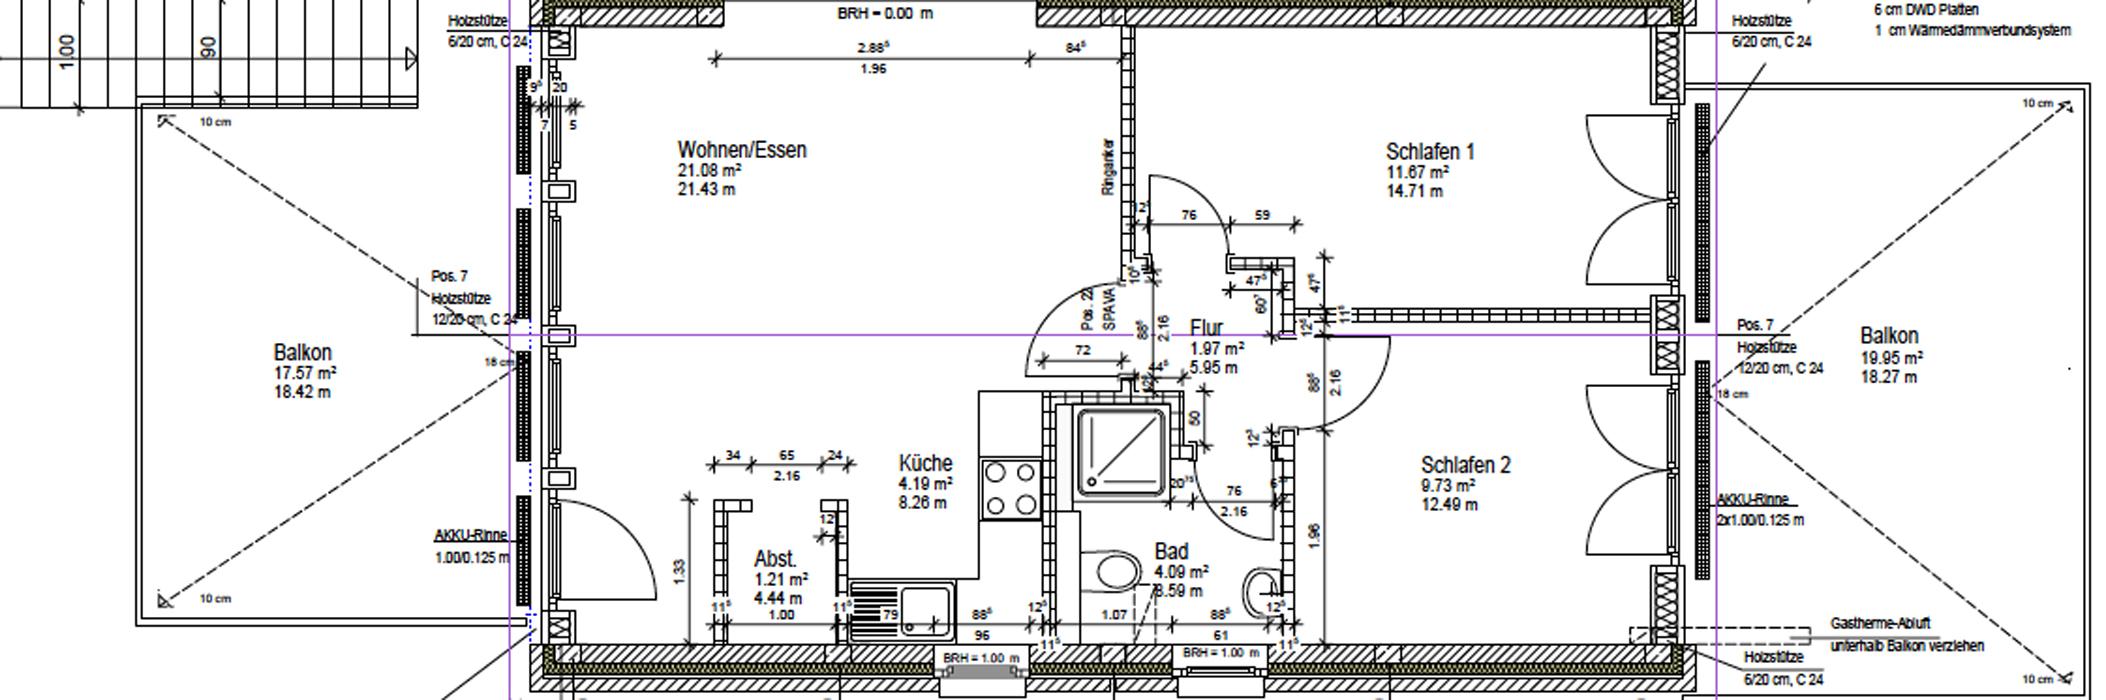 3 raum appartement im dachgeschoss boardinghouse b sum. Black Bedroom Furniture Sets. Home Design Ideas